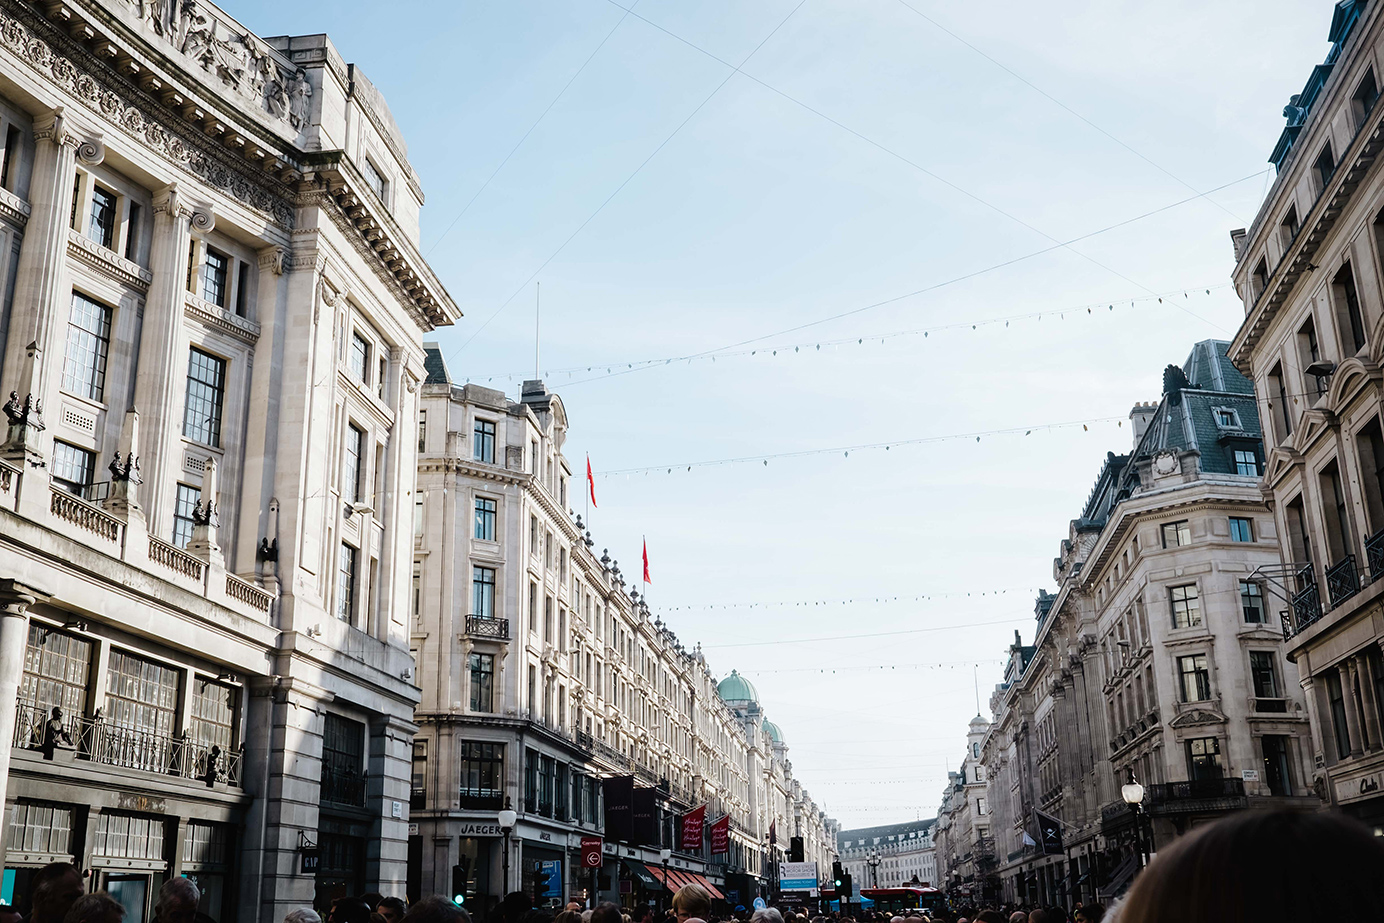 151030_streetone_london_09